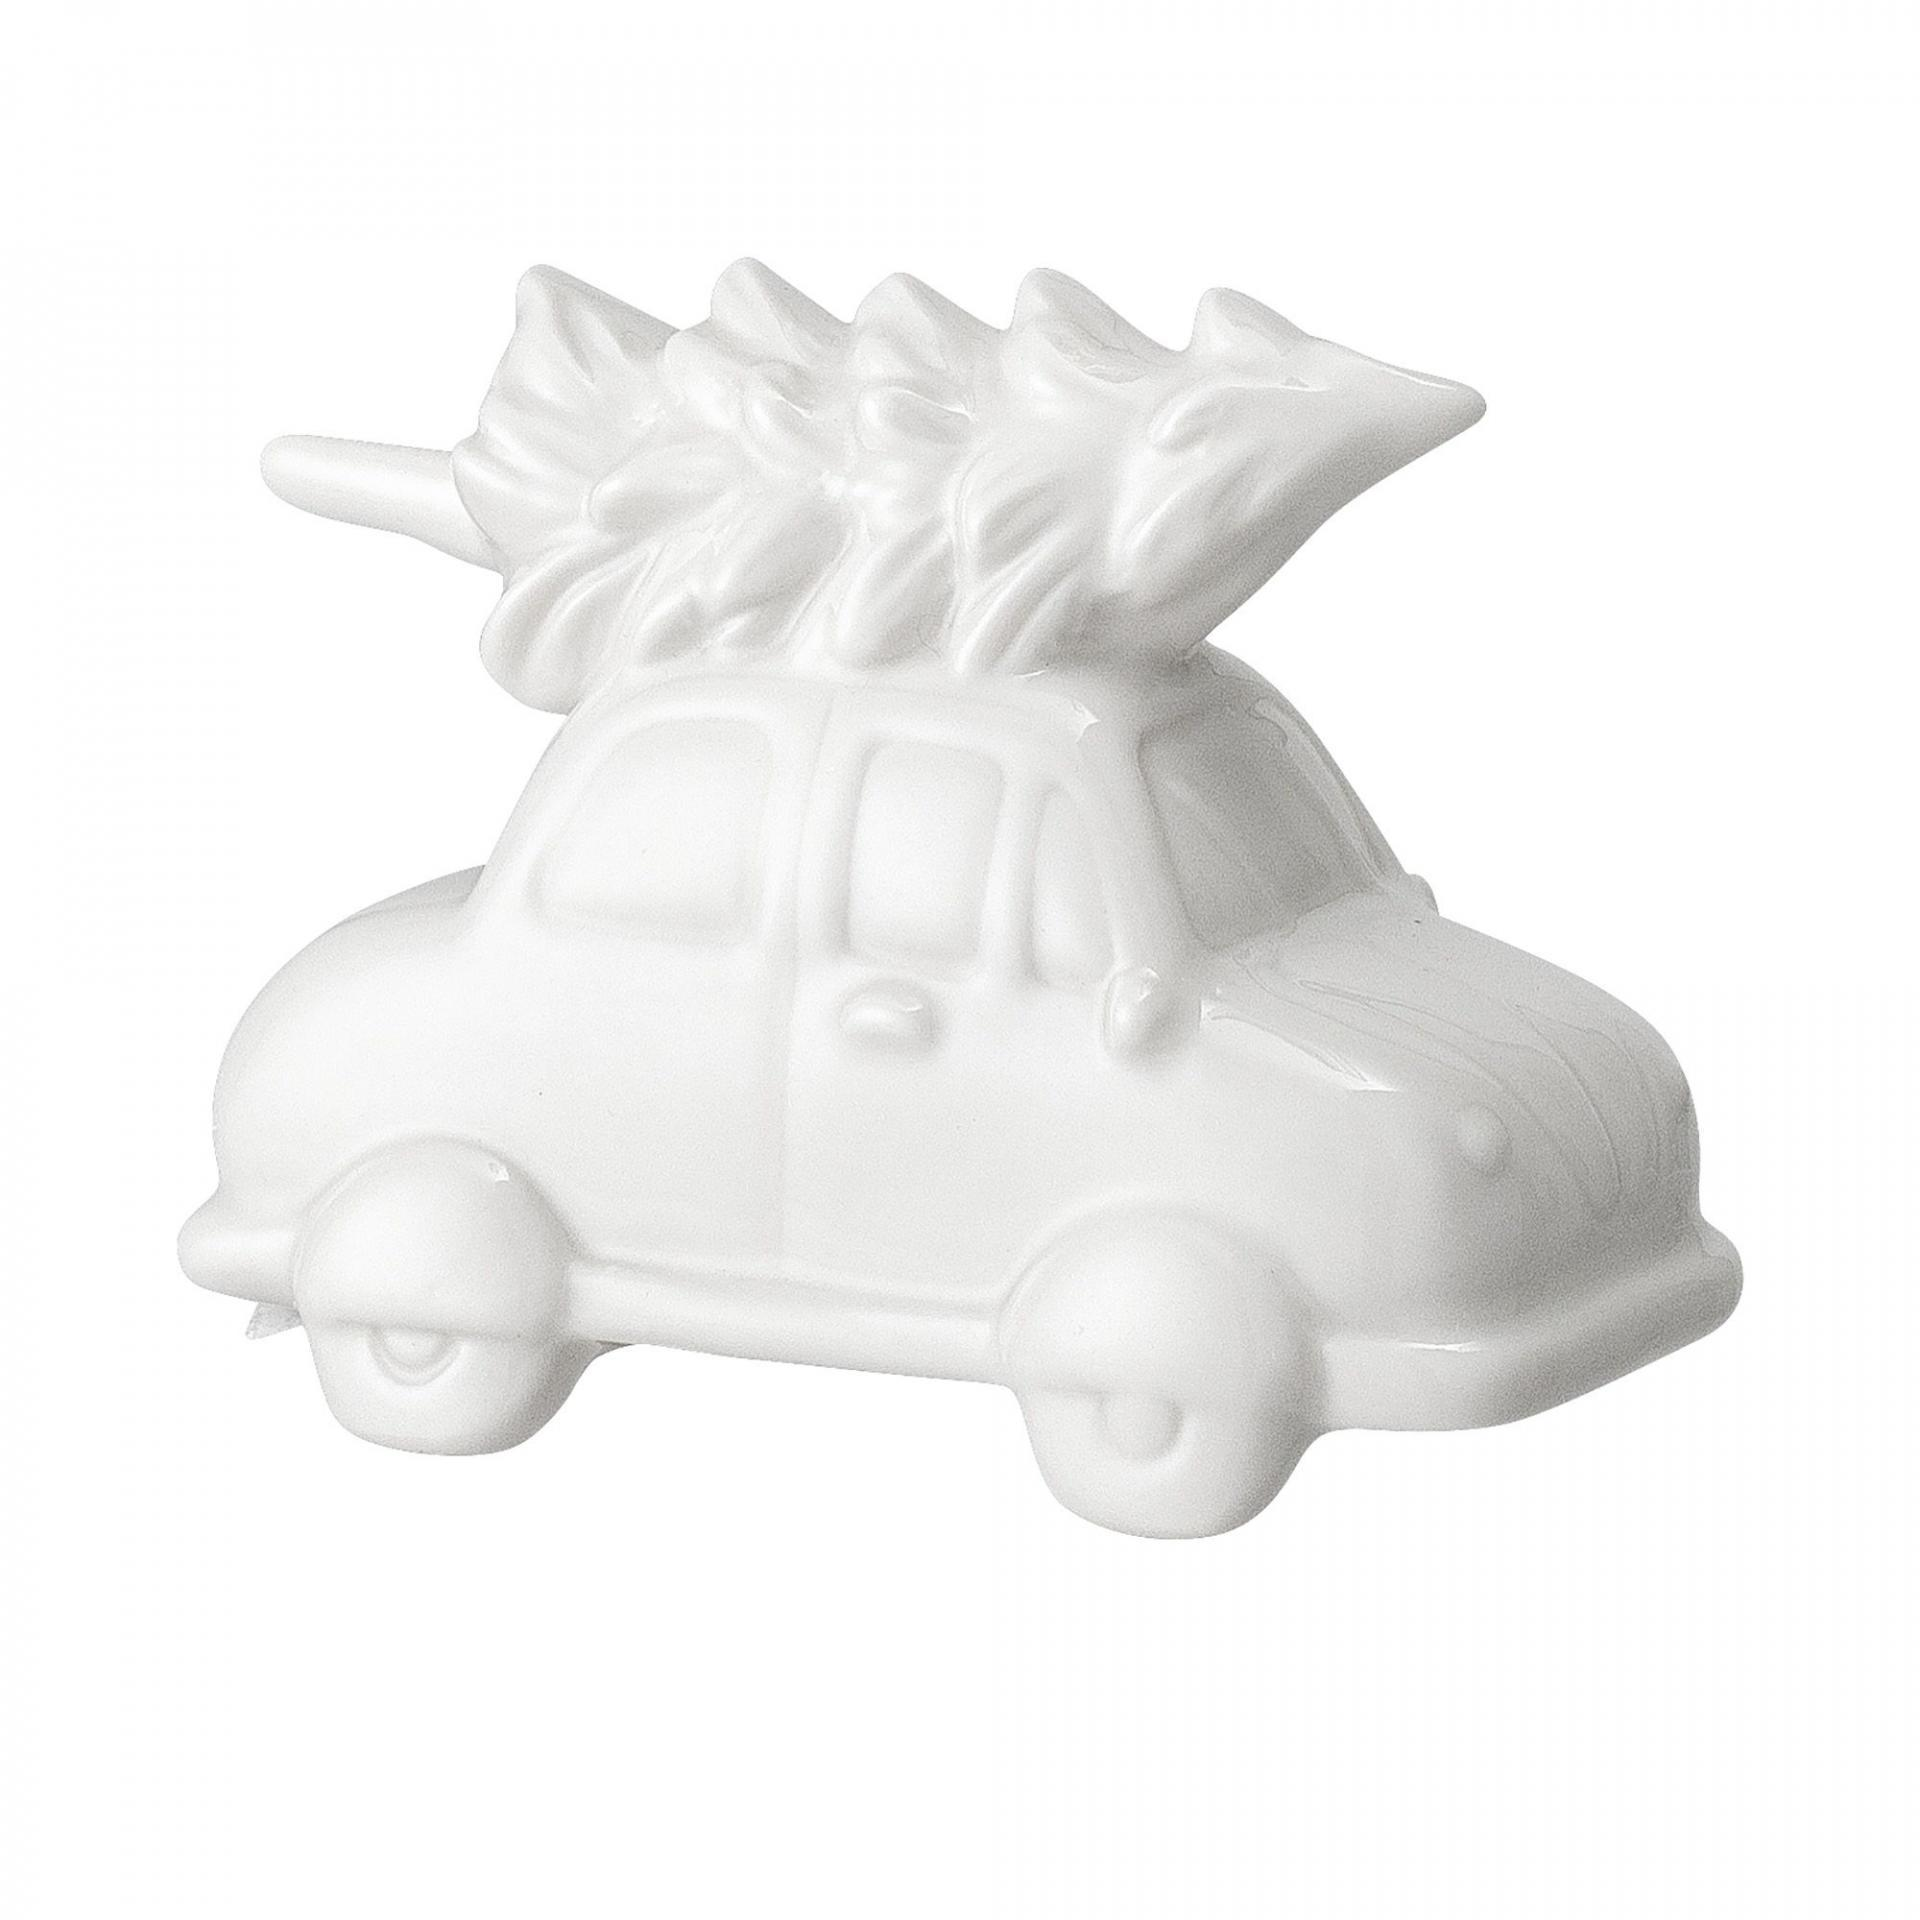 Bloomingville Porcelánové autíčko White, bílá barva, porcelán